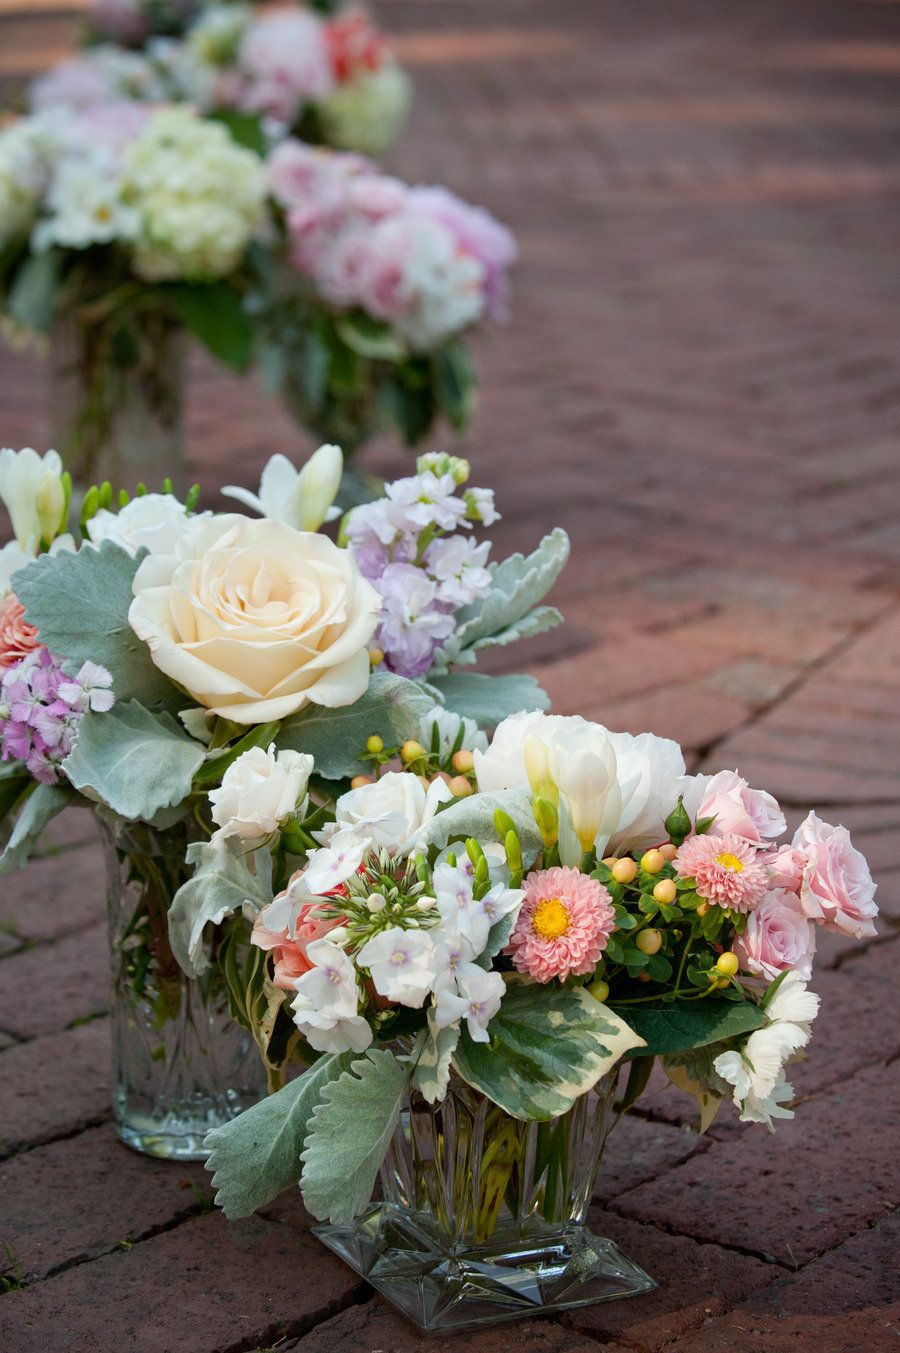 Outdoor garden wedding decoration ideas  Lakewold Gardens Wedding from Carol Harrold Photography  Wedding